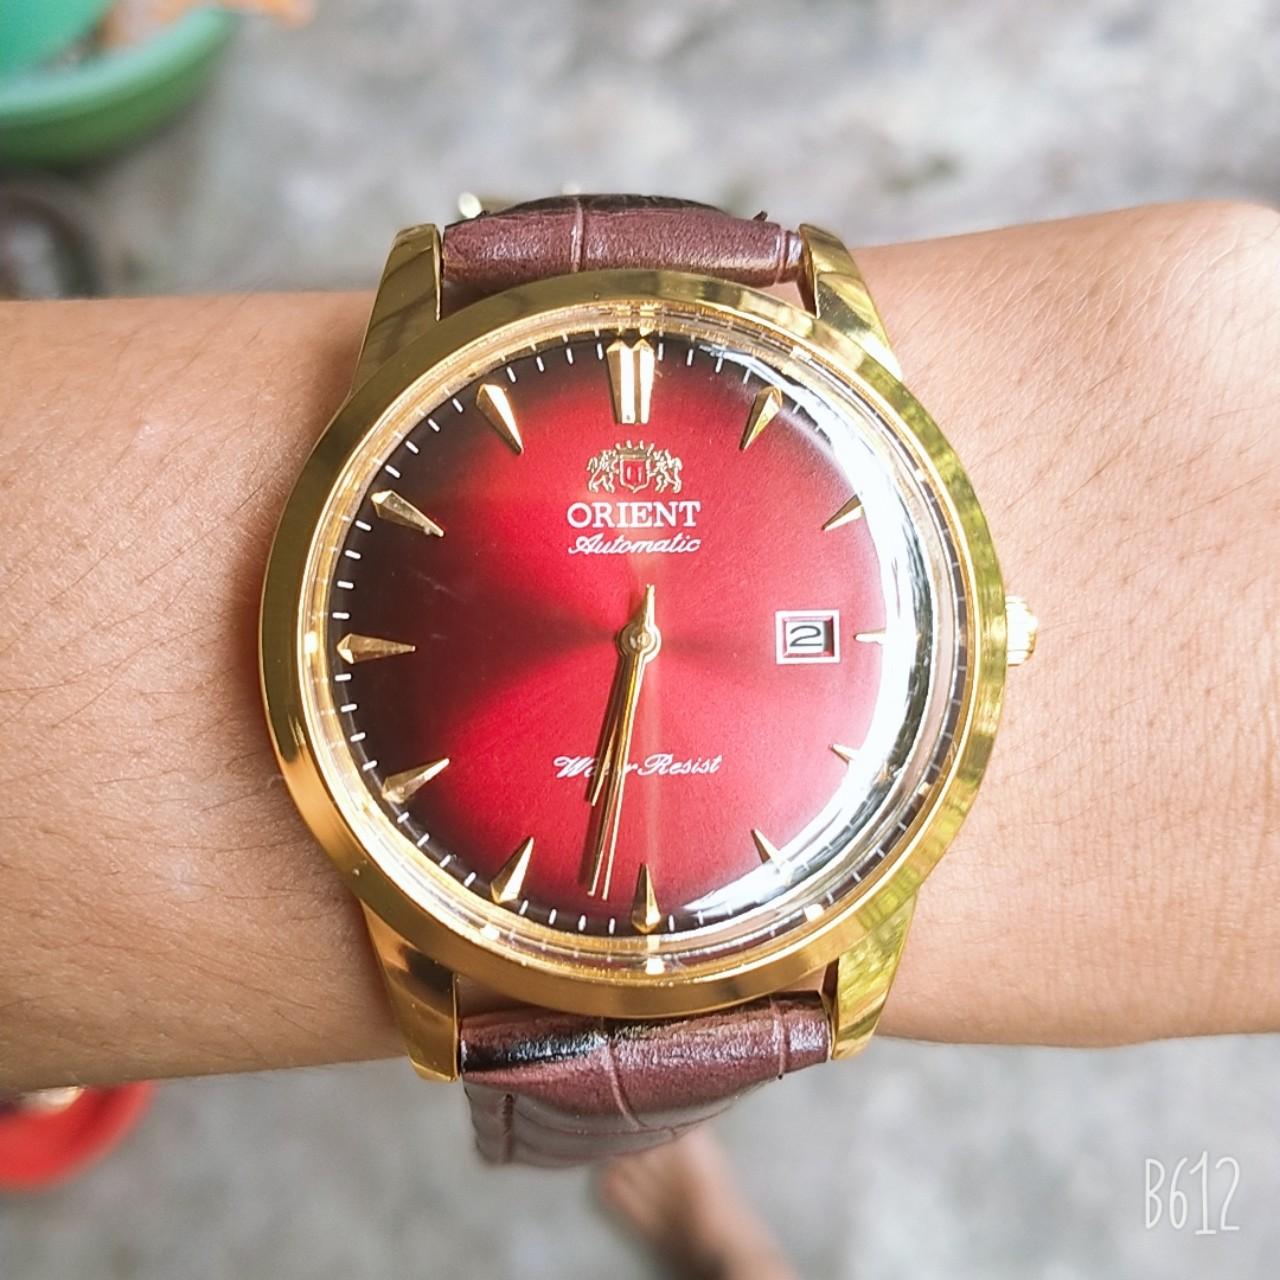 Đồng hồ nam ORIENT Automatic ( cơ lộ máy ) thumbnail